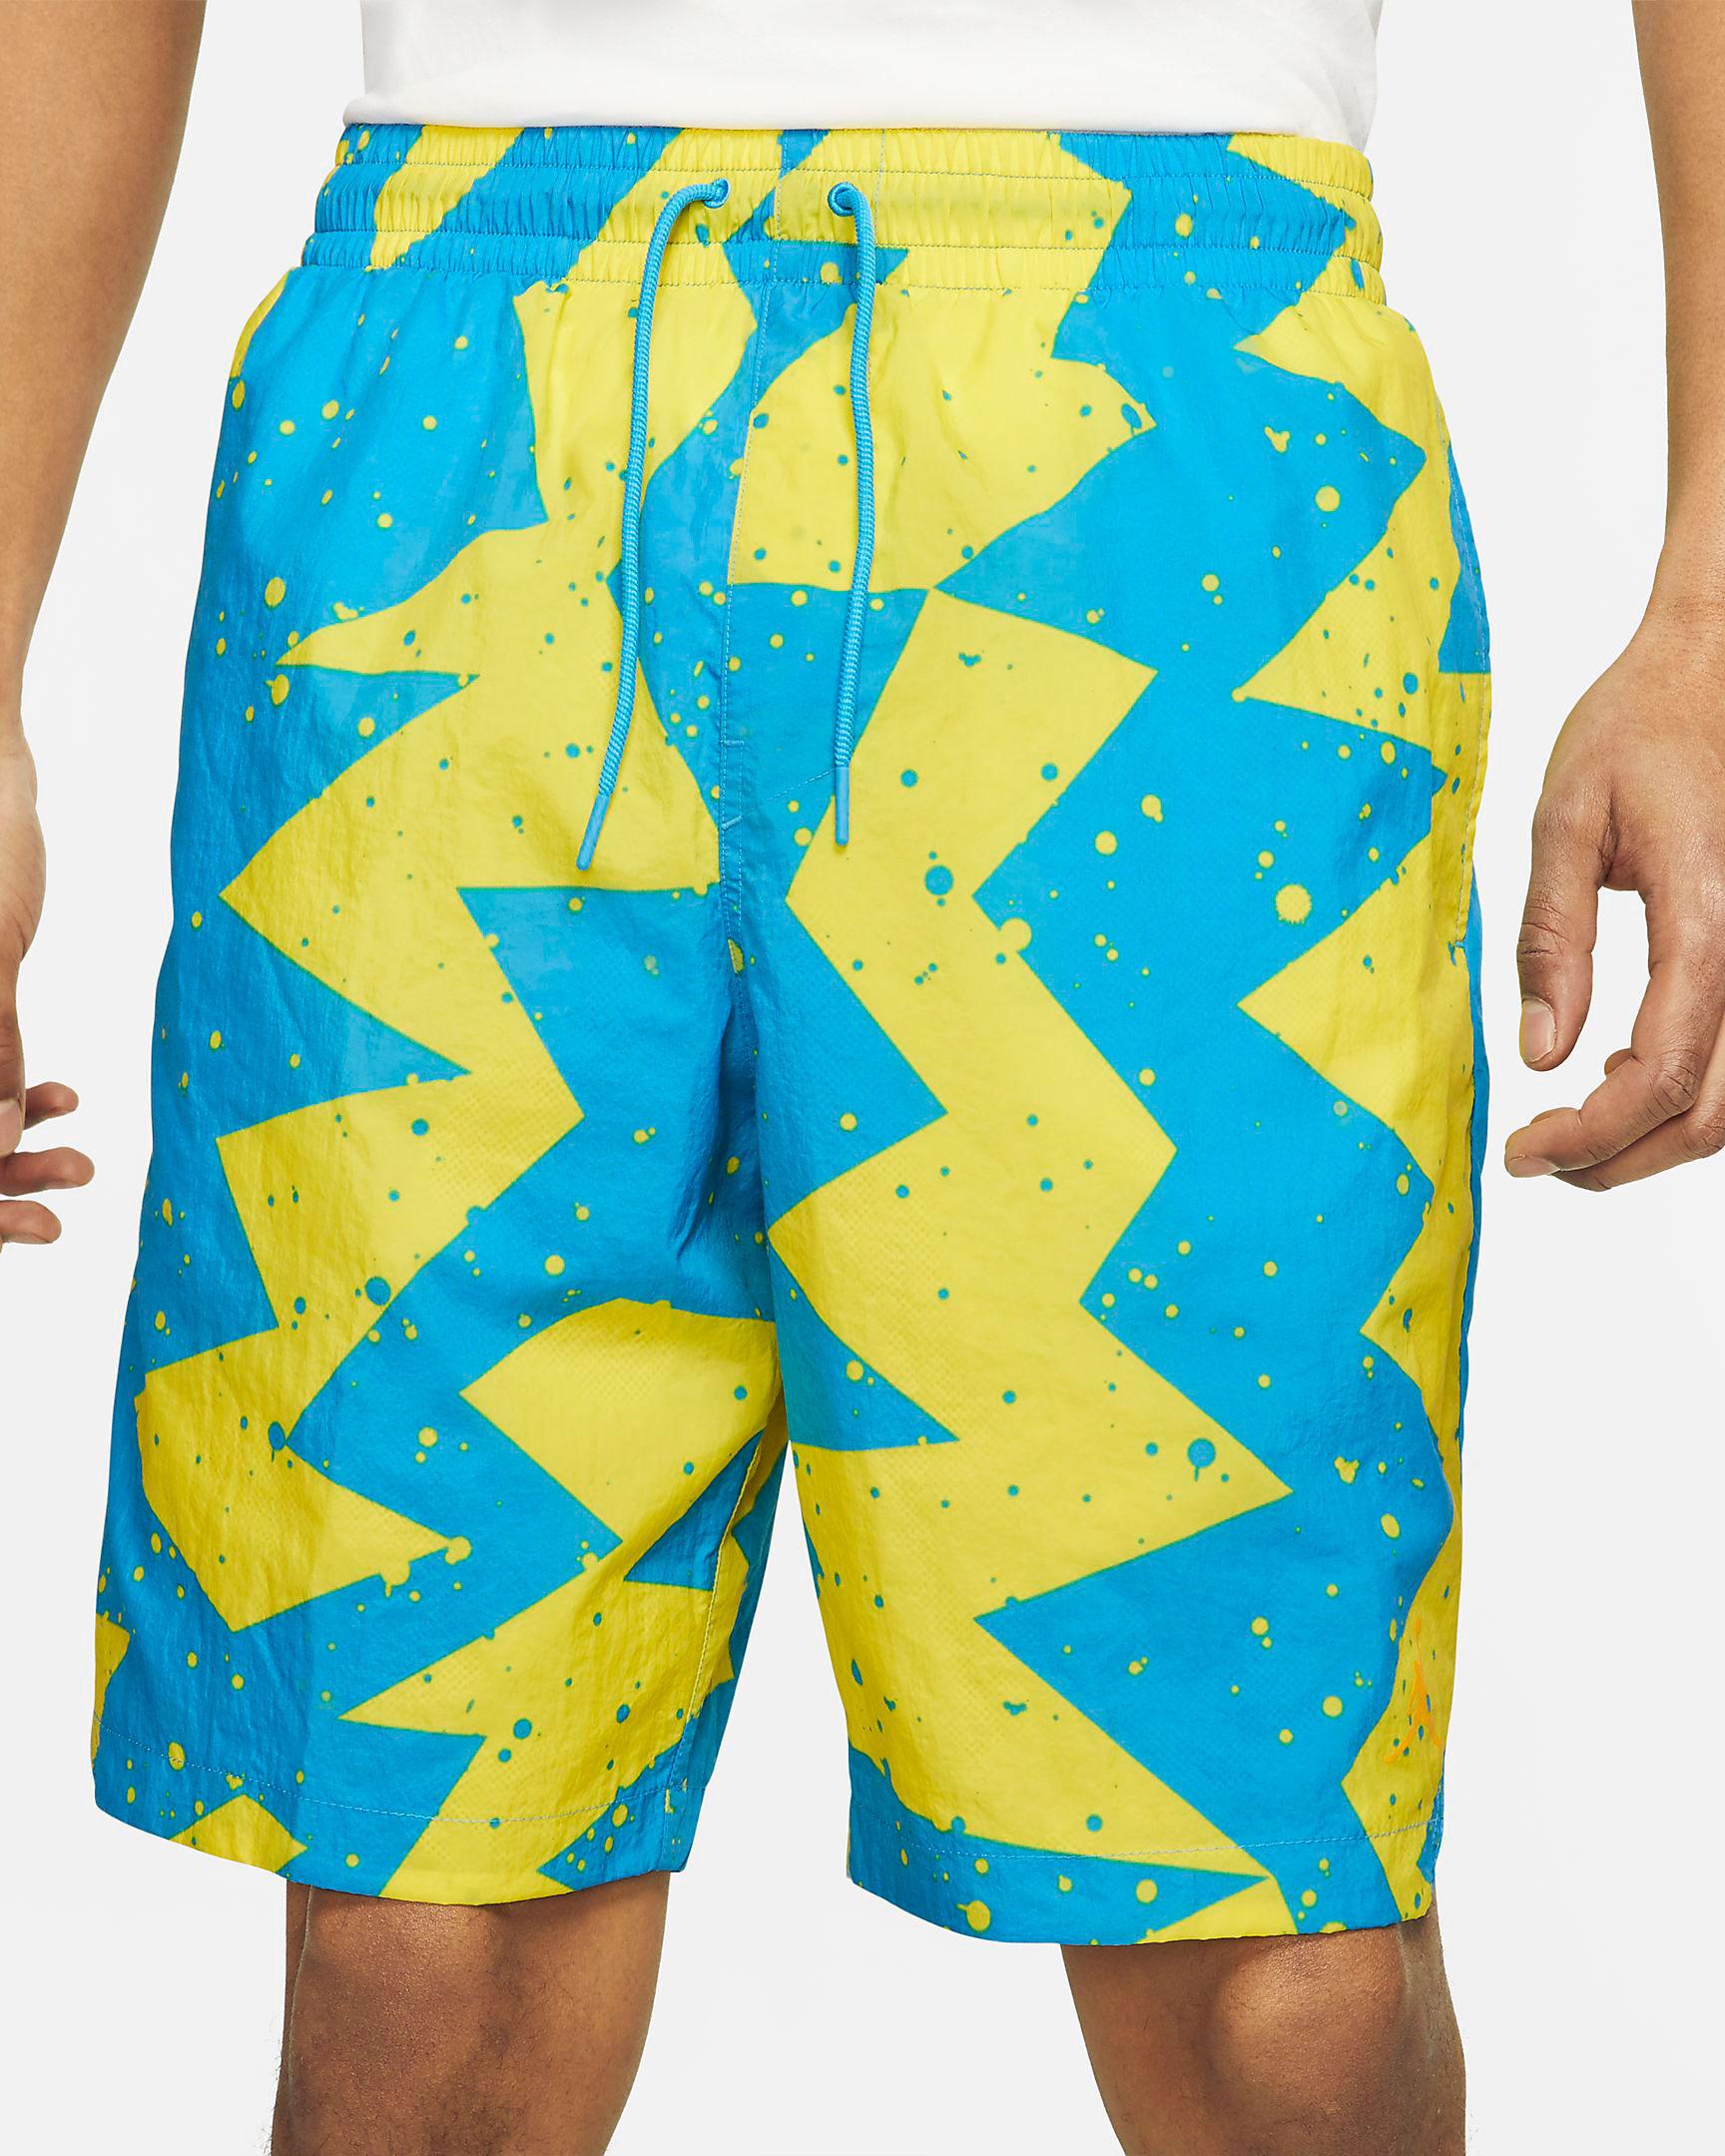 nike-sb-dunk-low-grateful-dead-yellow-bear-shorts-match